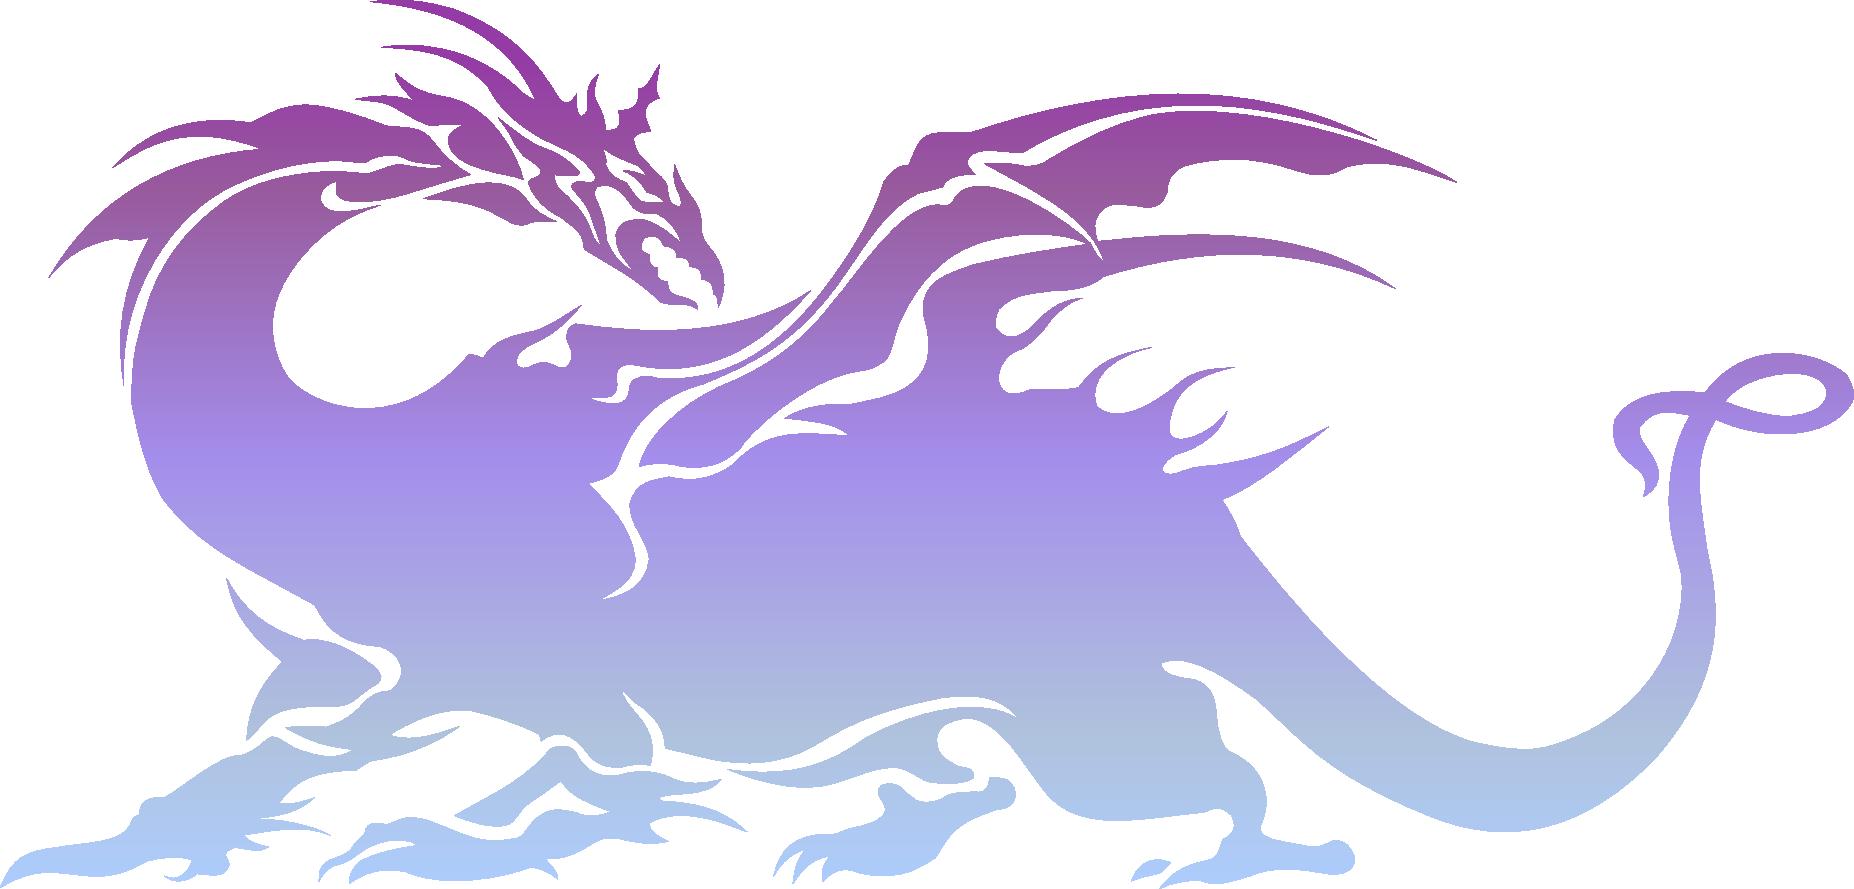 Final Fantasy V Final Fantasy Art Final Fantasy Logo Final Fantasy Tattoo